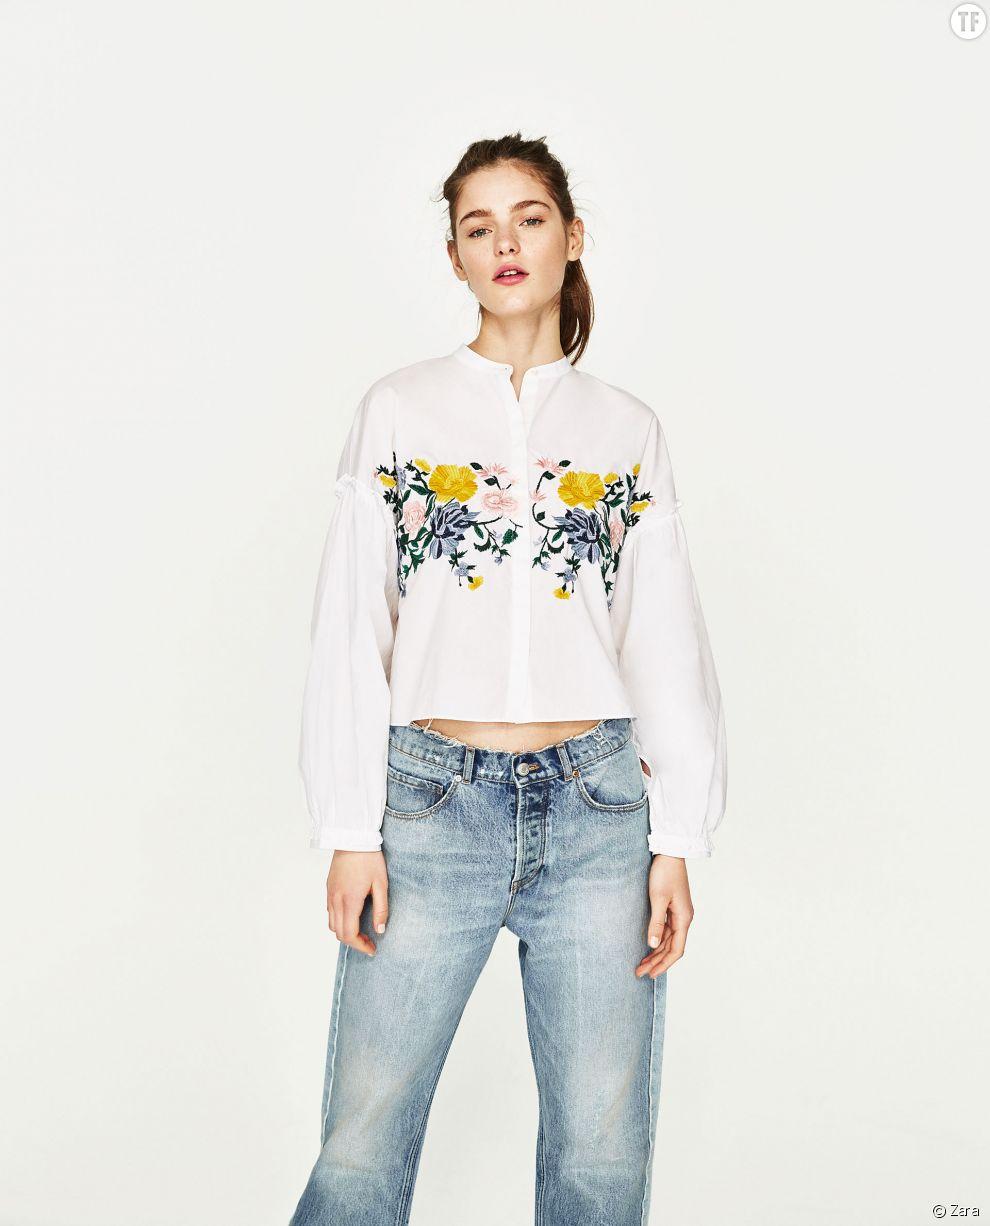 Chemise brodée de fleurs Zara, 19,99€